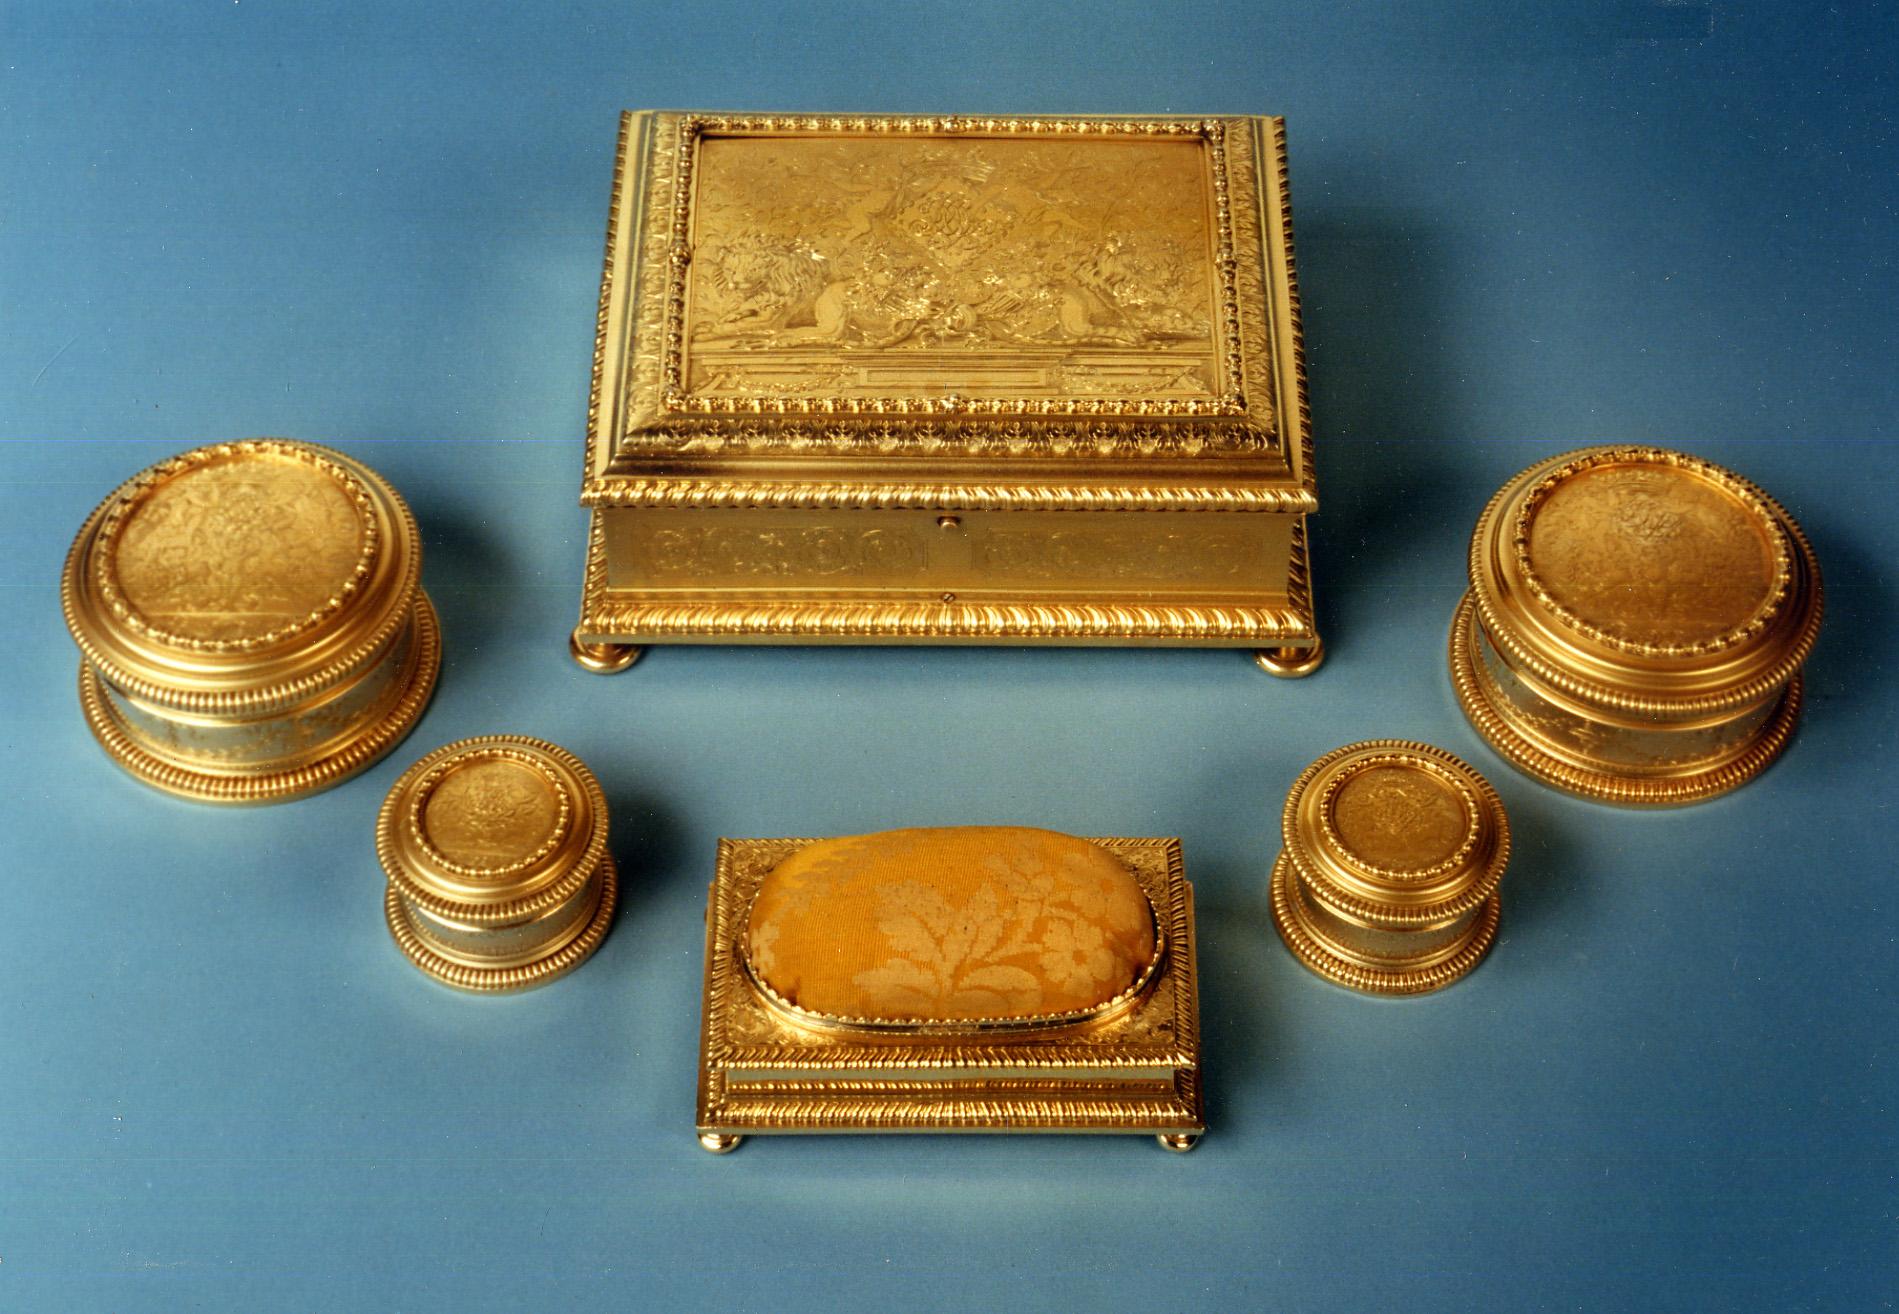 A William III silver-gilt toilet service, Pierre Harache II, 1695.